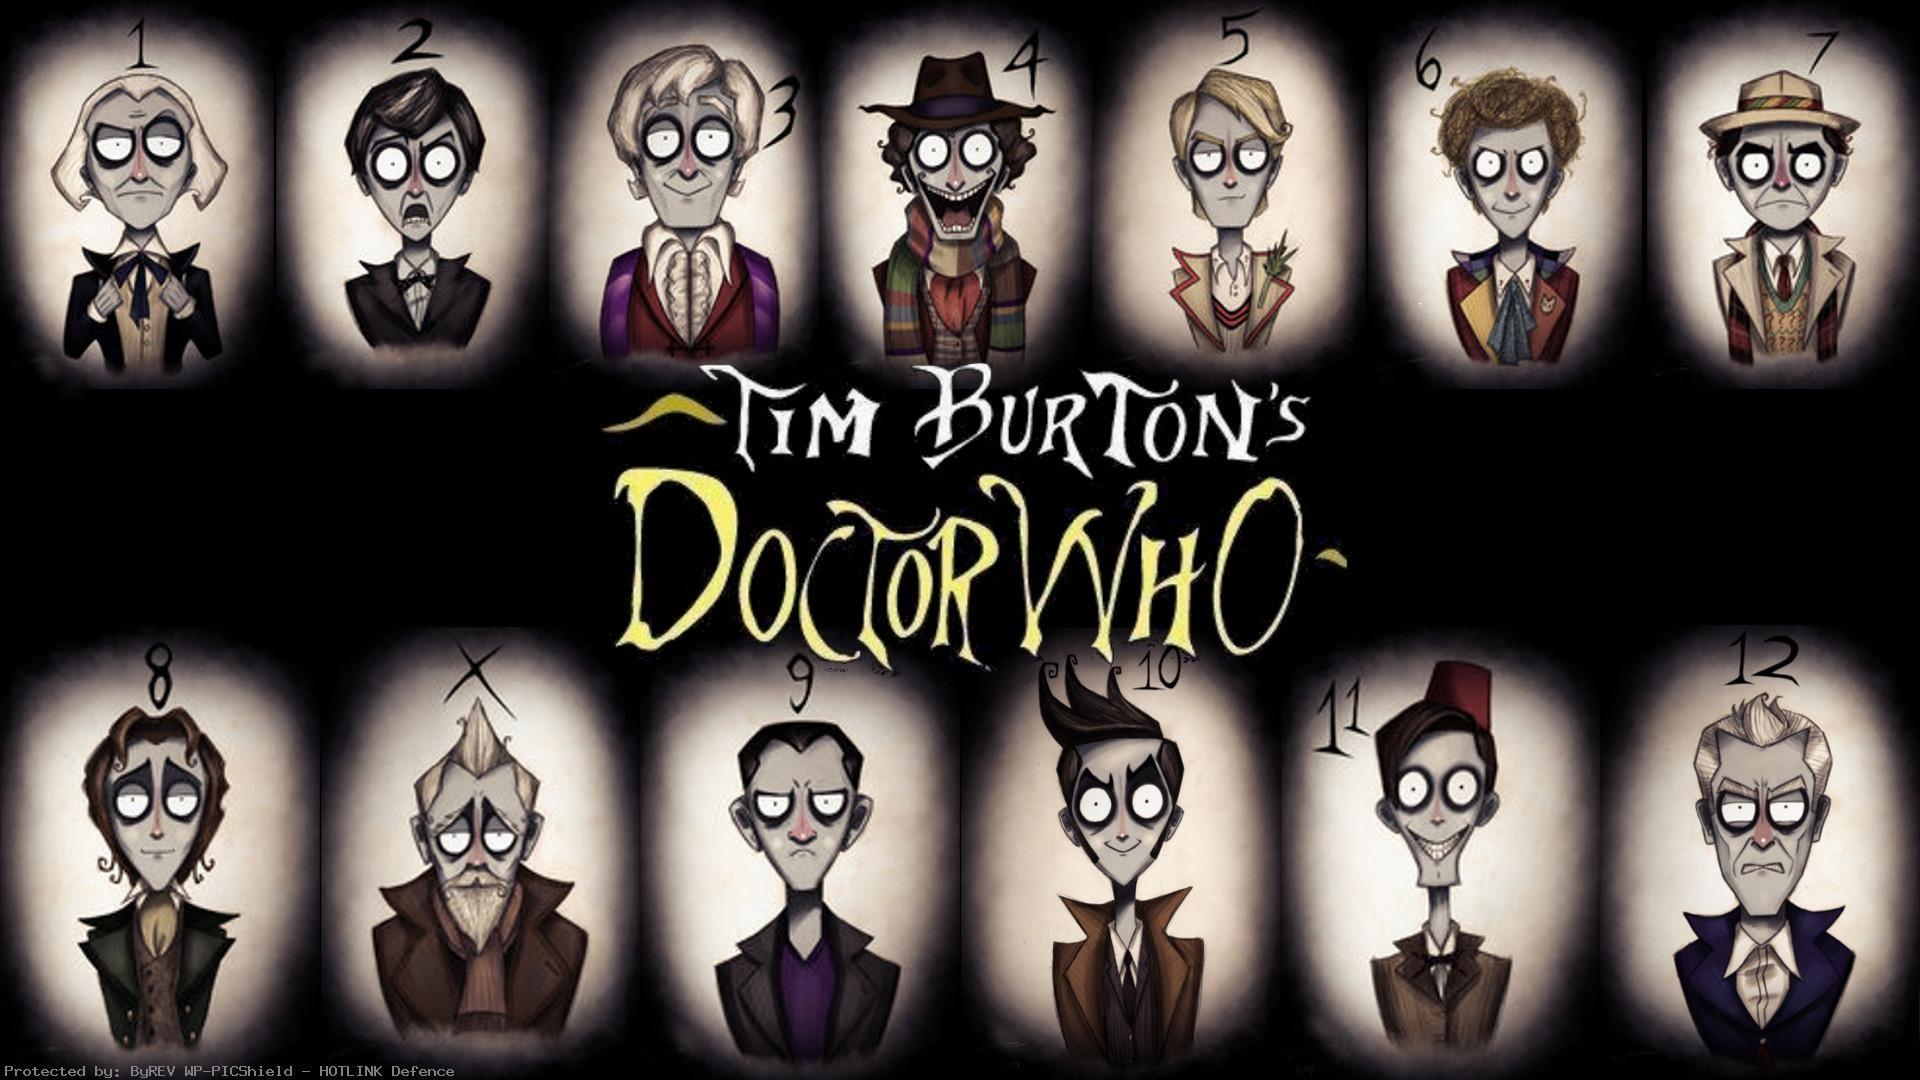 Tim-Burton-s-Doctor-Who-1920×1080-Imgur-wallpaper-